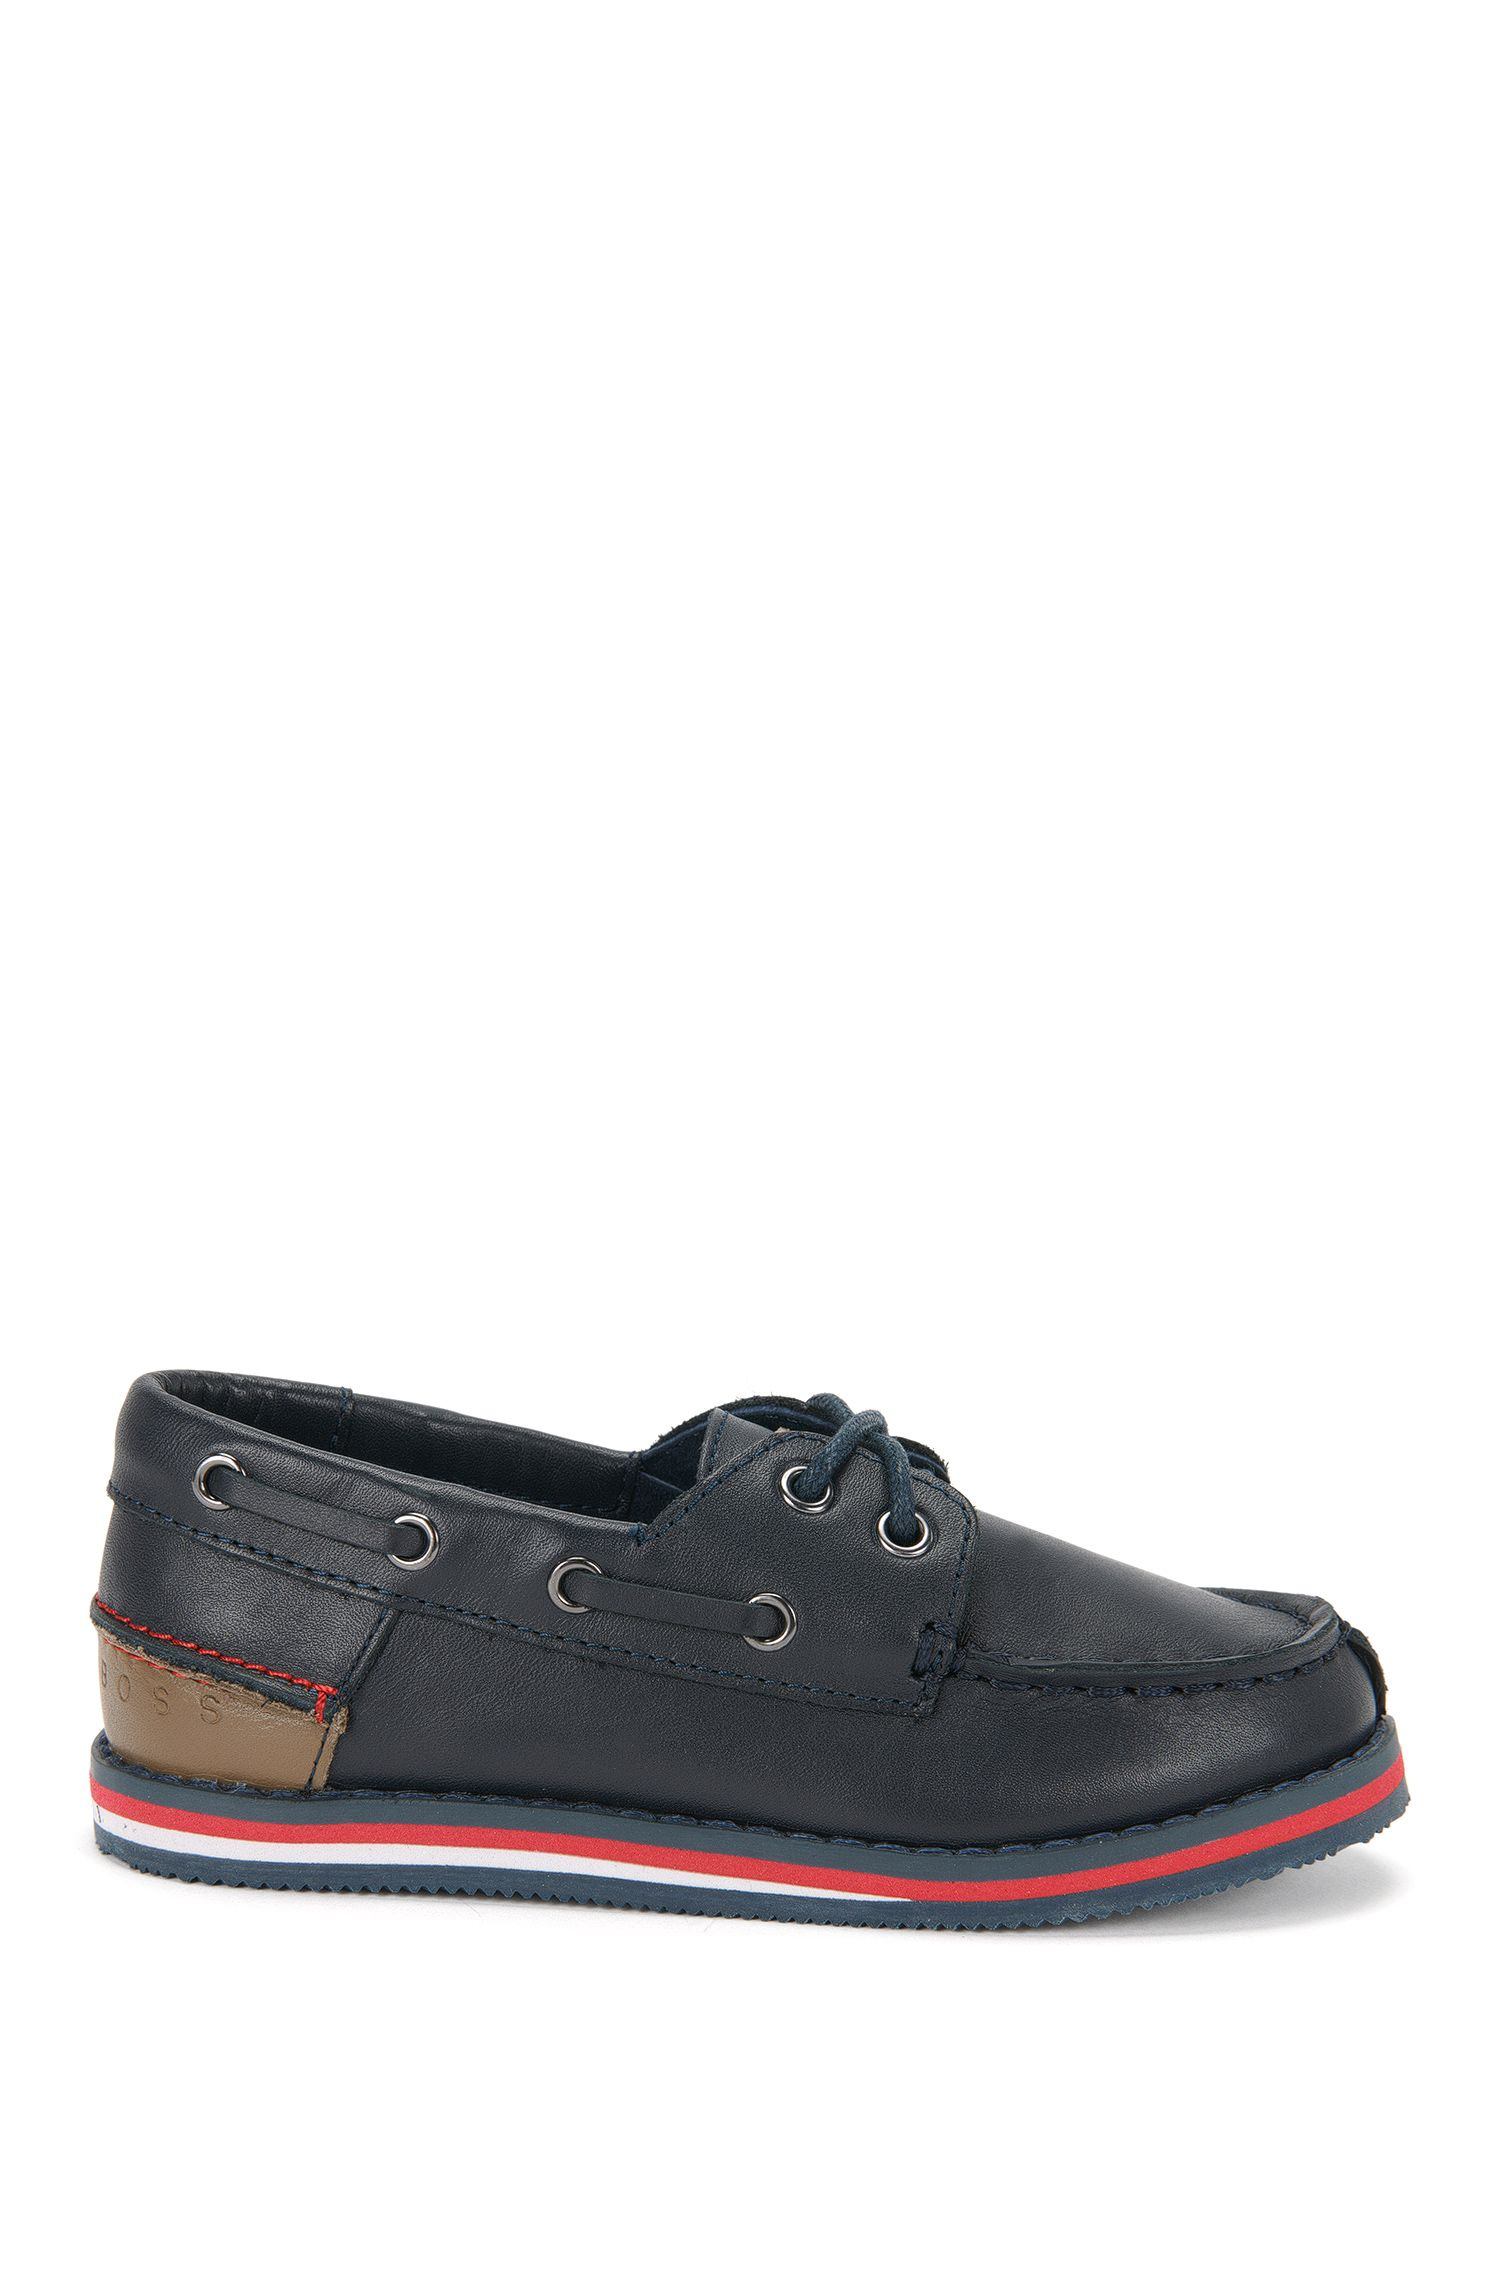 'J29116'   Boys Leather Boat Shoes, Dark Blue